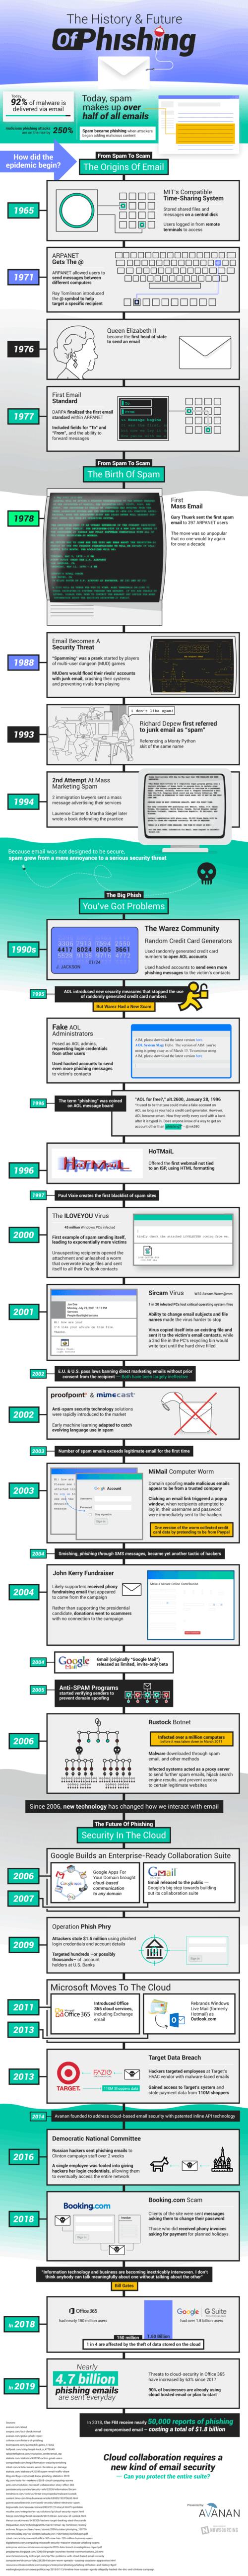 The Progression of Phishing via Brian Wallace